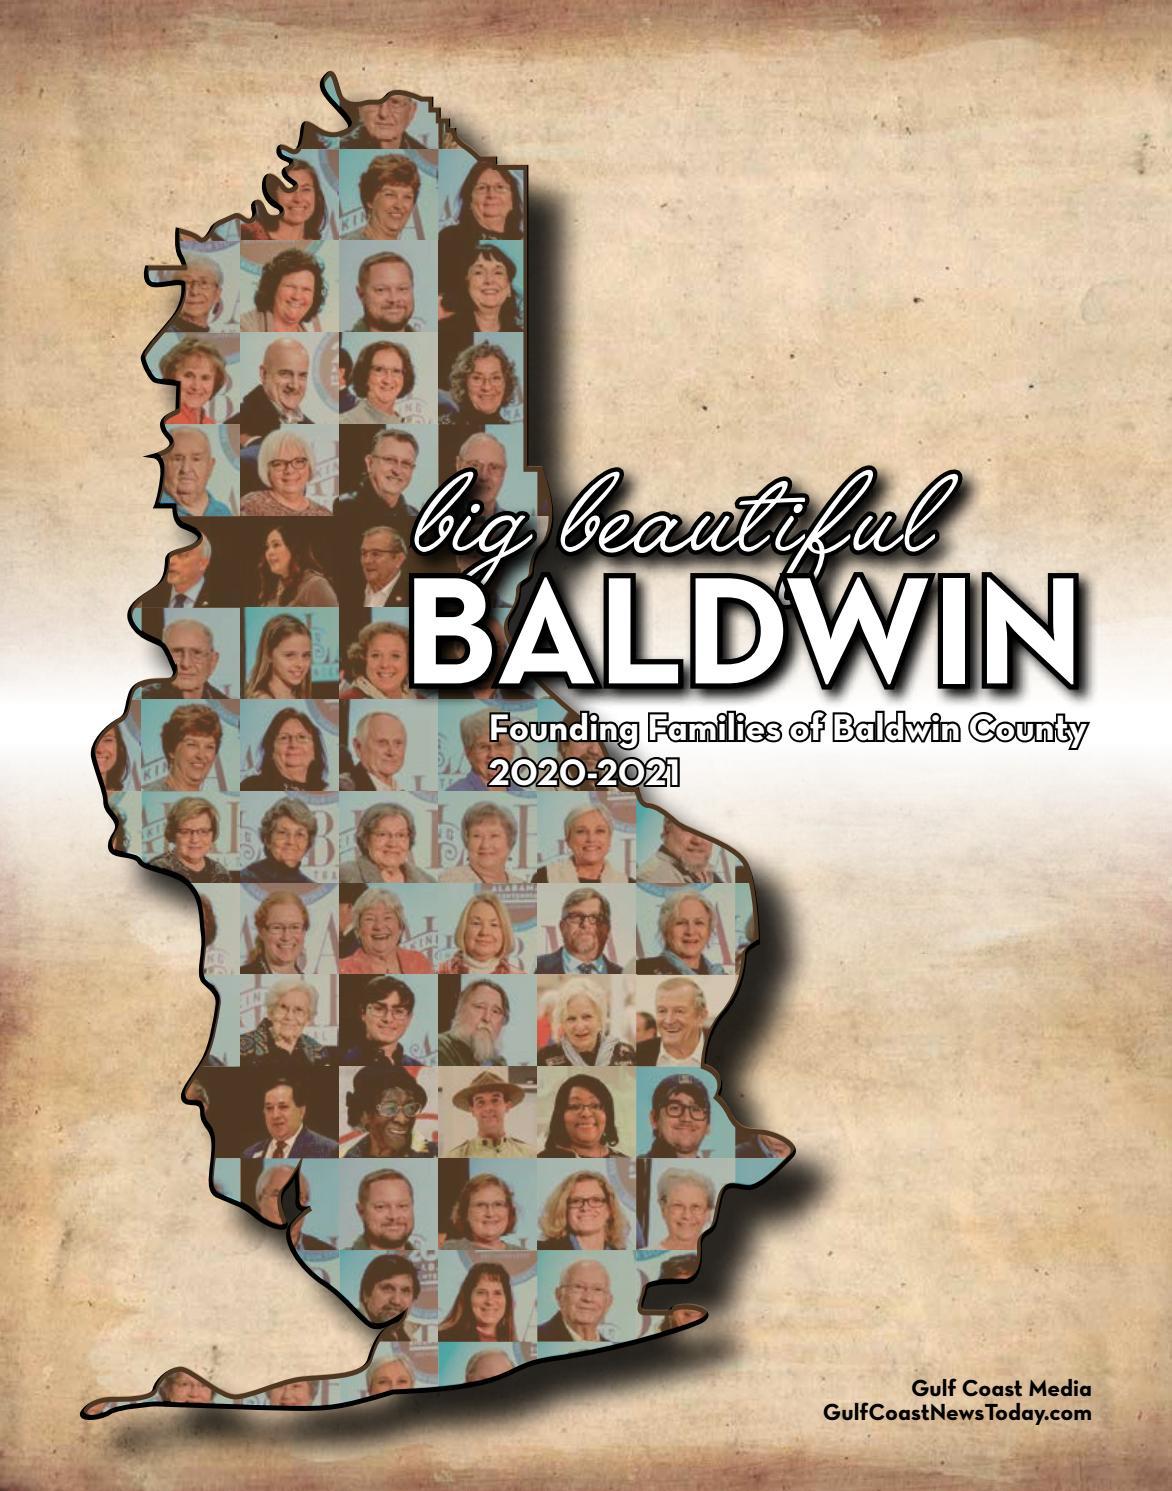 Big Beautiful Baldwin 2020 2021 By Gulf Coast Media Issuu